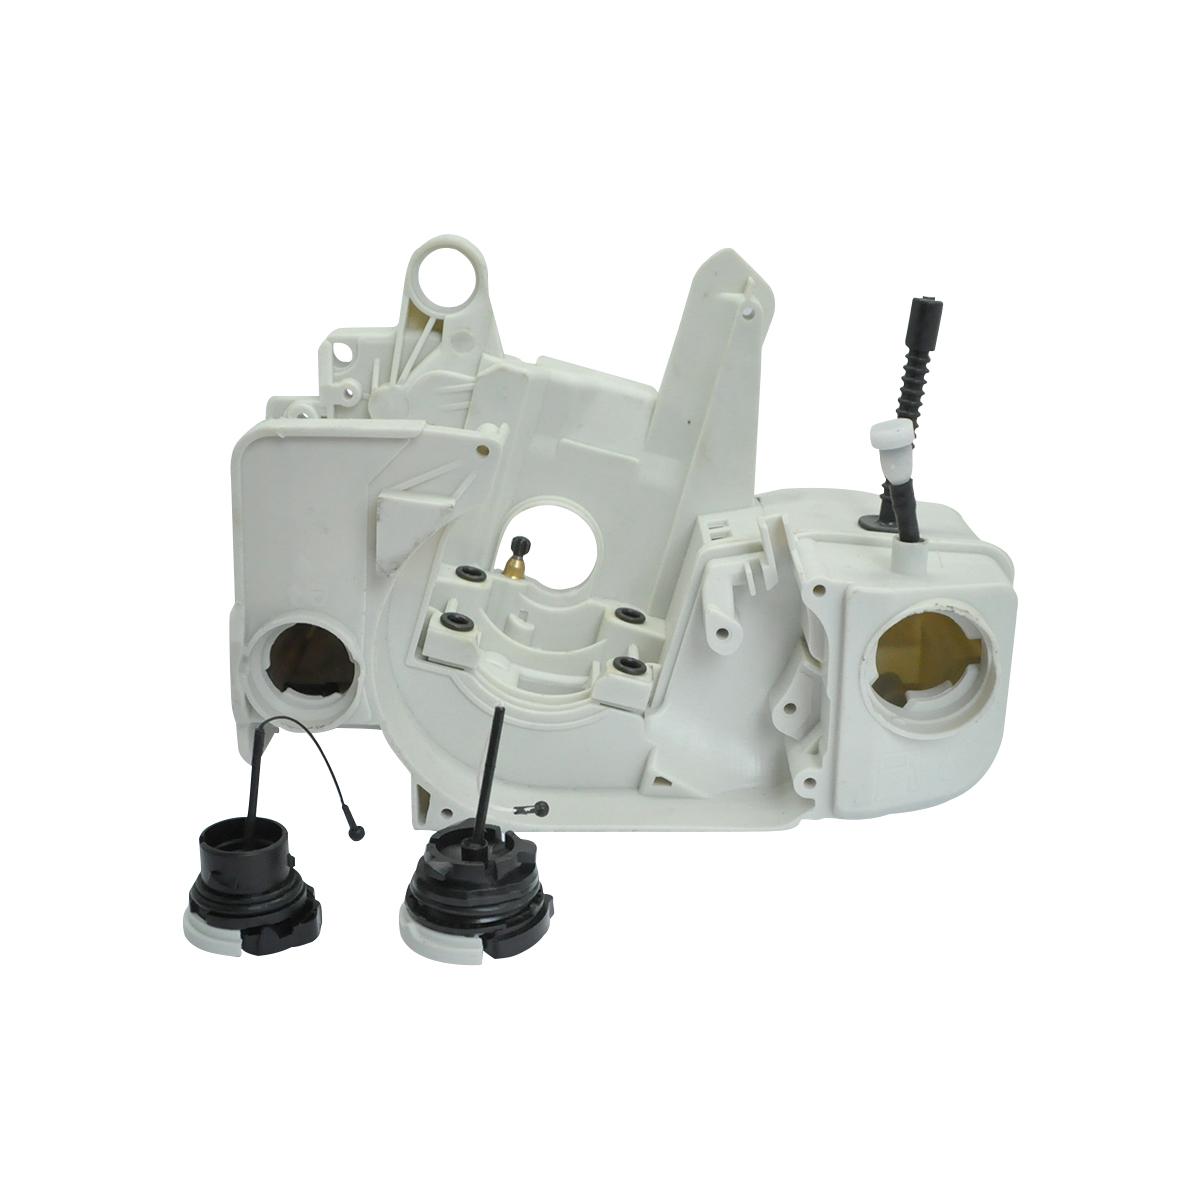 Crankcase Fuel Gas Cap For STIHL 021 023 025 MS210 MS230 MS250 OEM 1123 020 3003